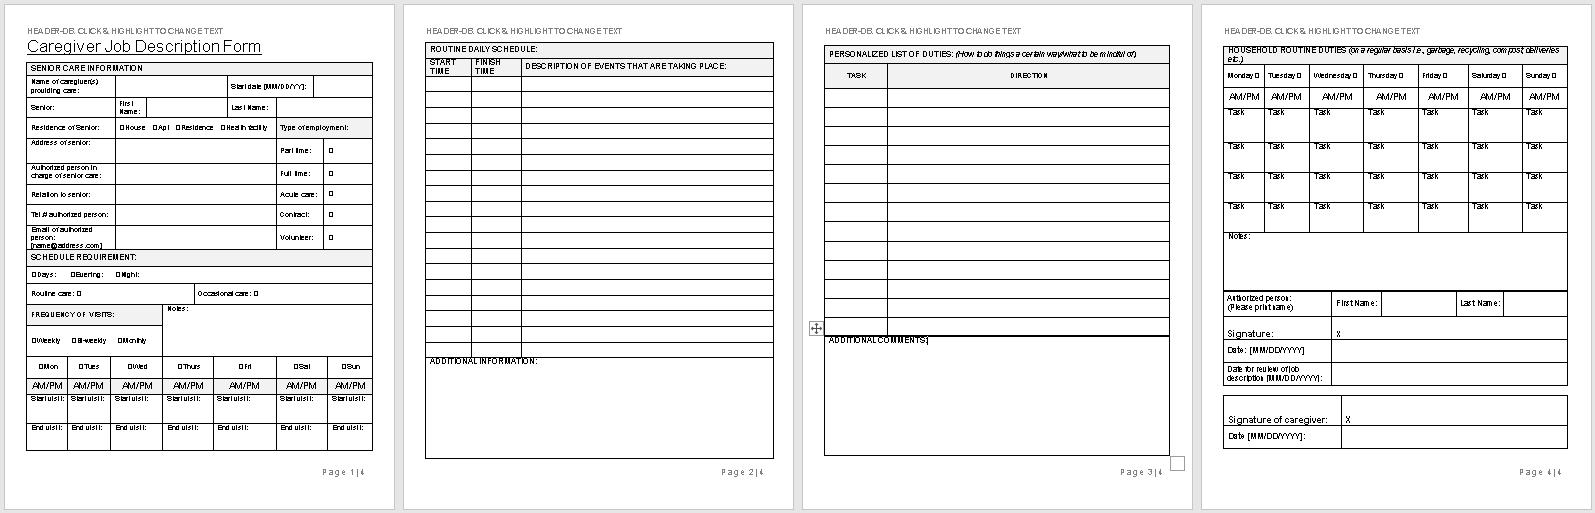 Caregiver Job Description Form Template-full preview-Hire Private-wise caregiving